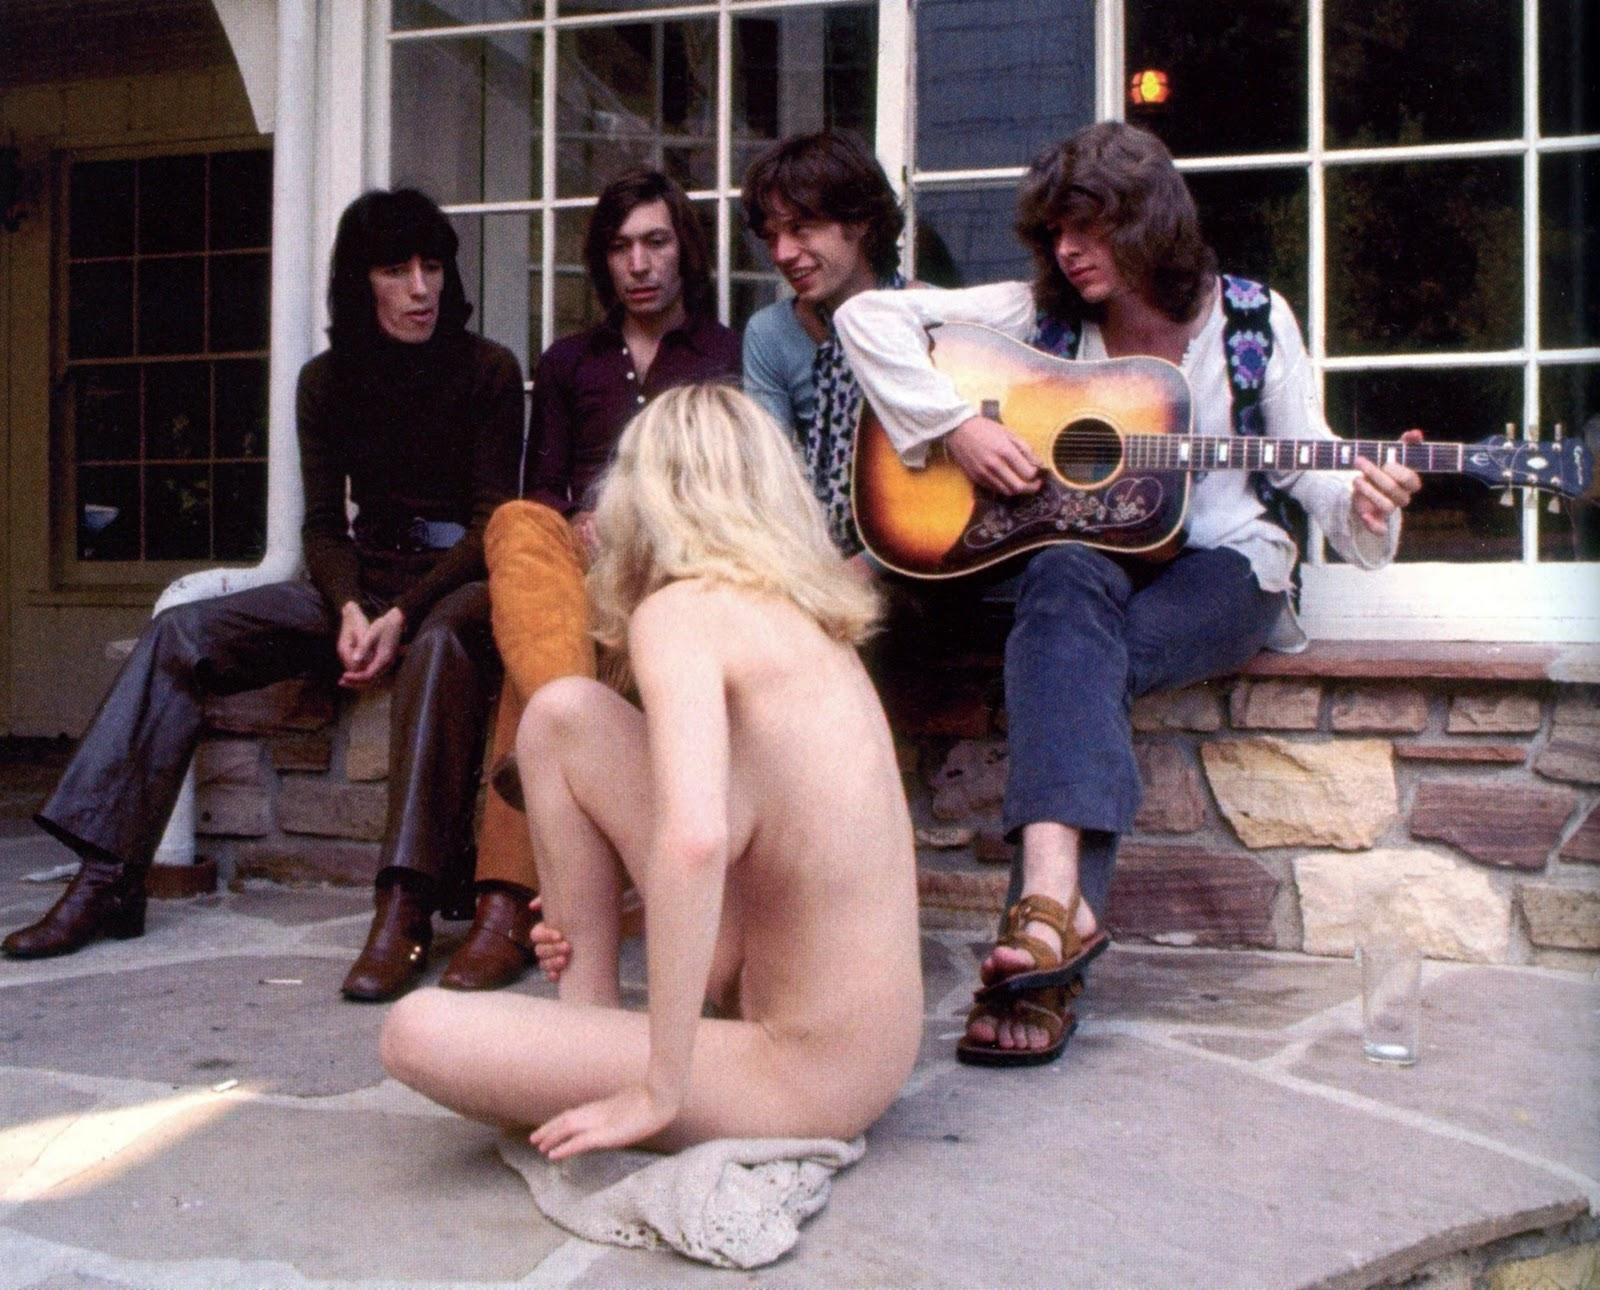 Rock groupies naked girls